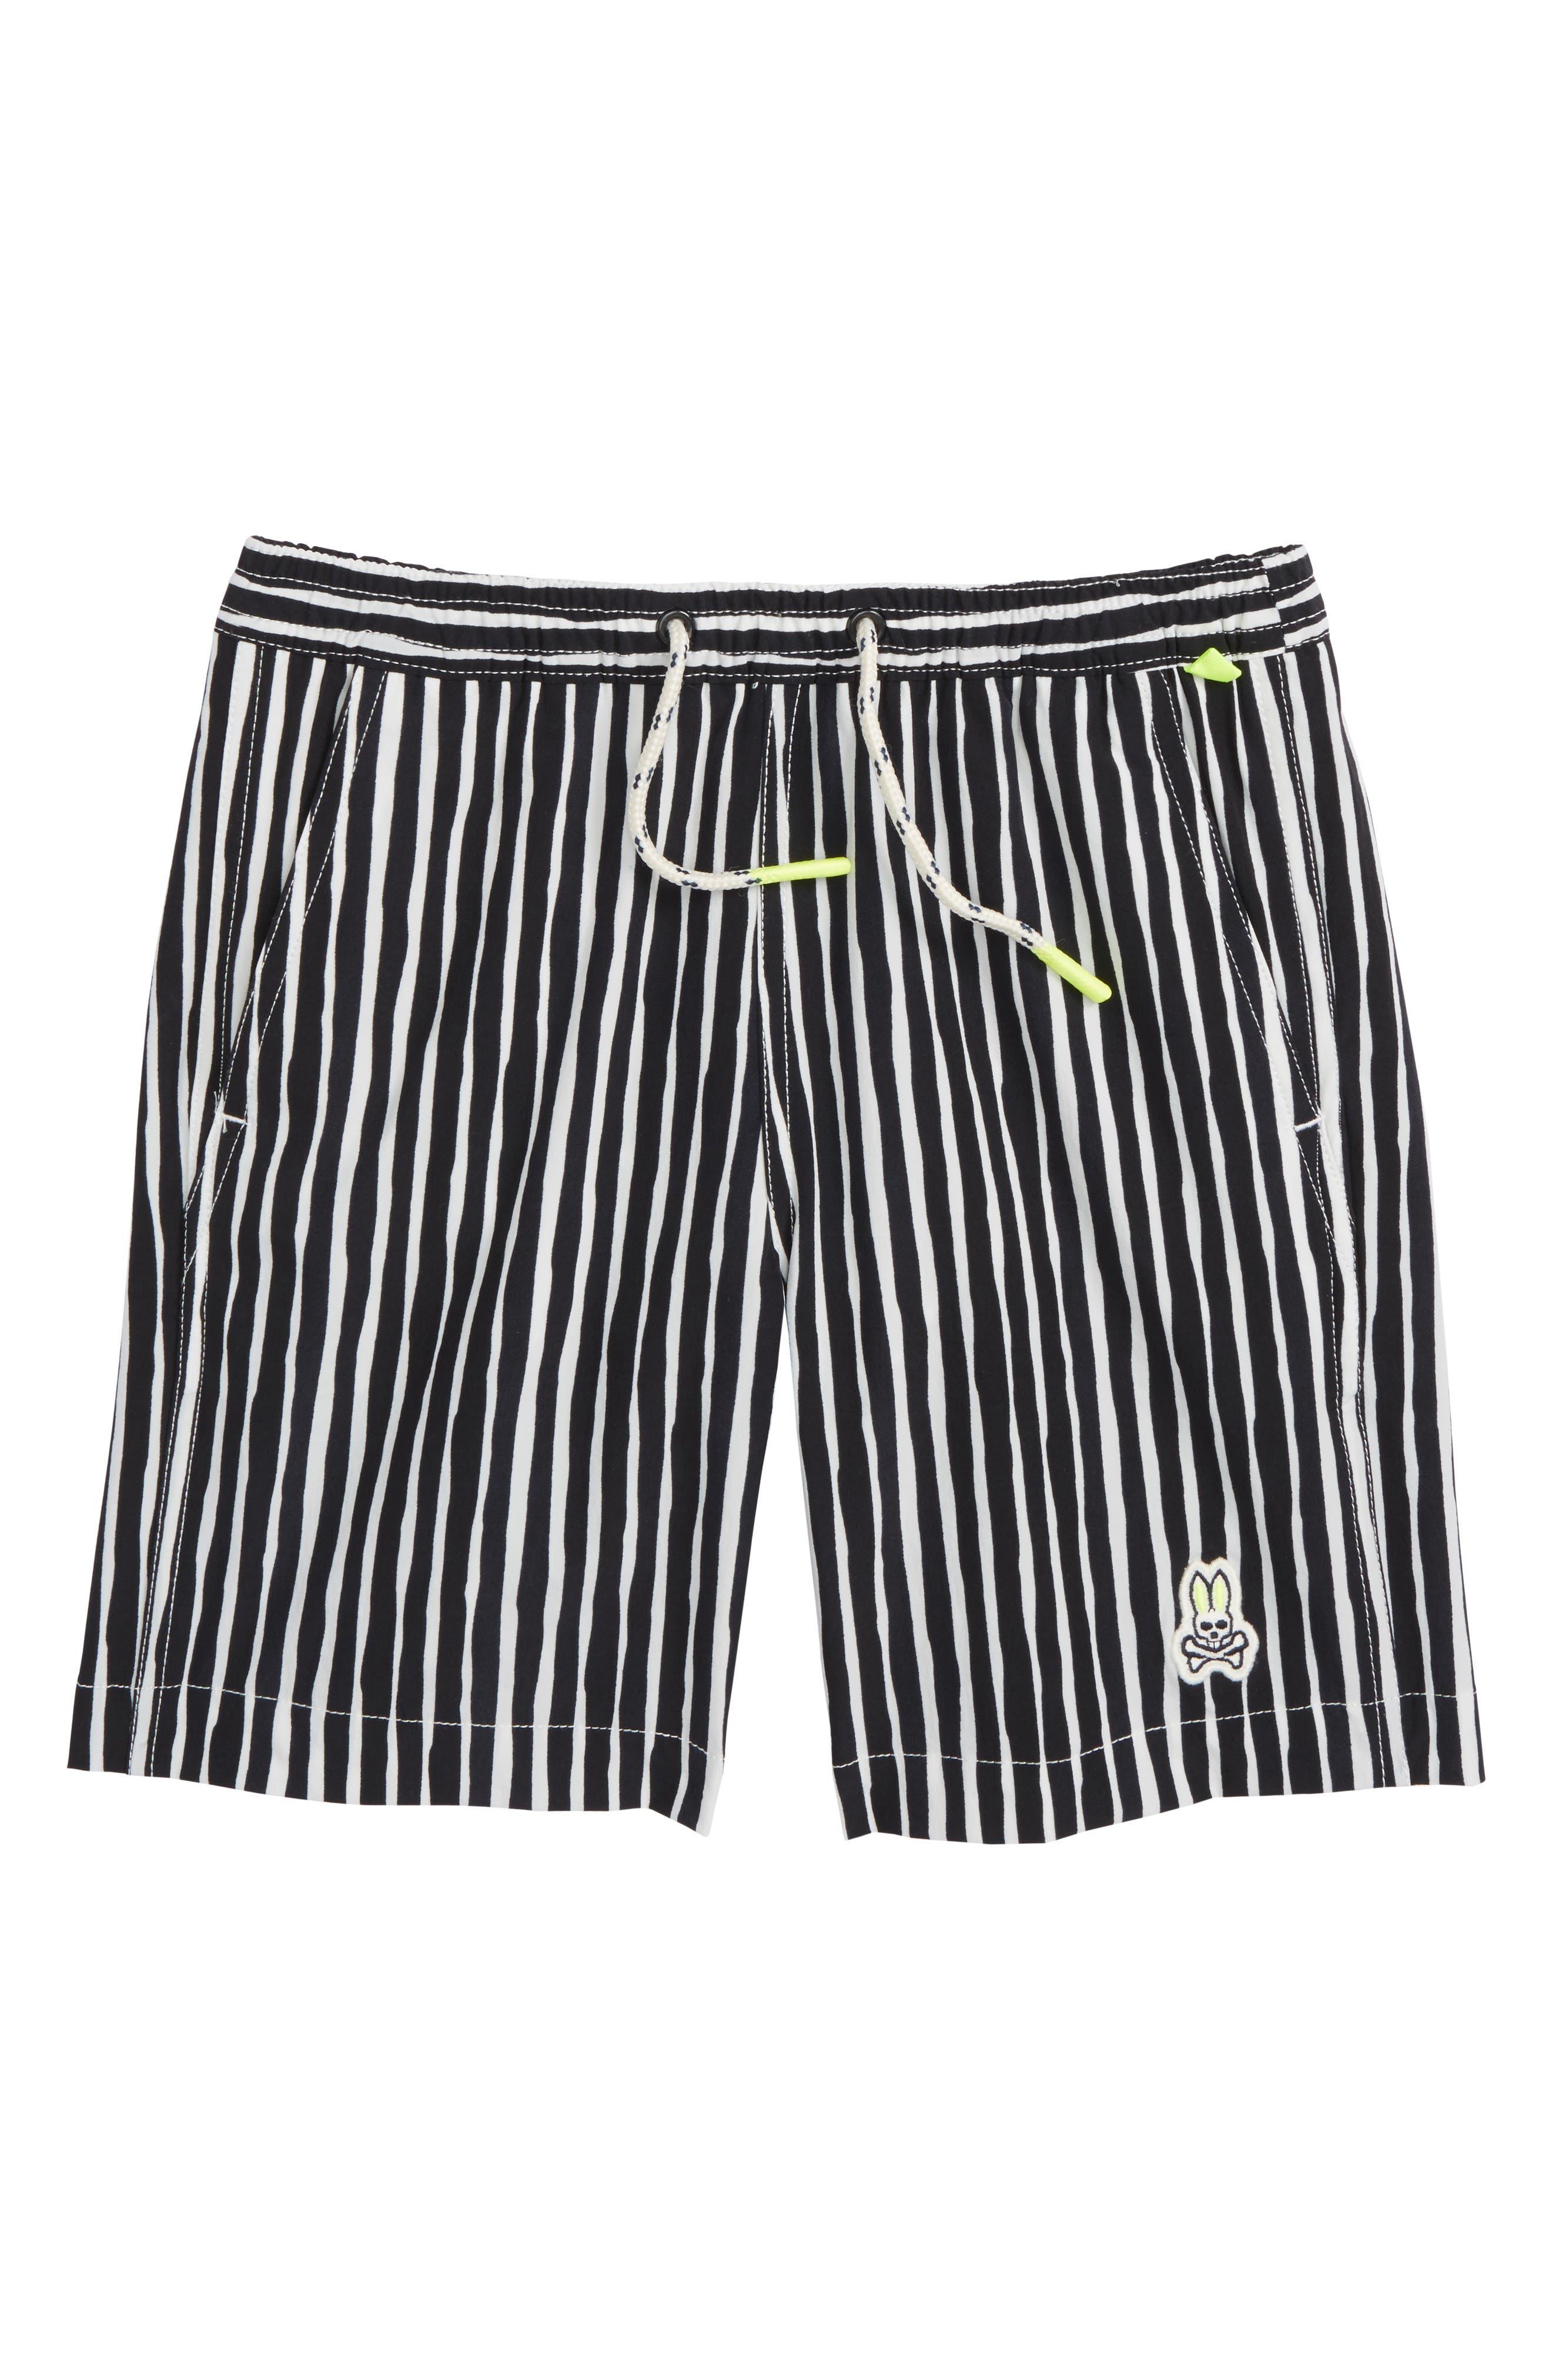 Watermark Vertical Stripe Swim Trunks,                         Main,                         color, 400